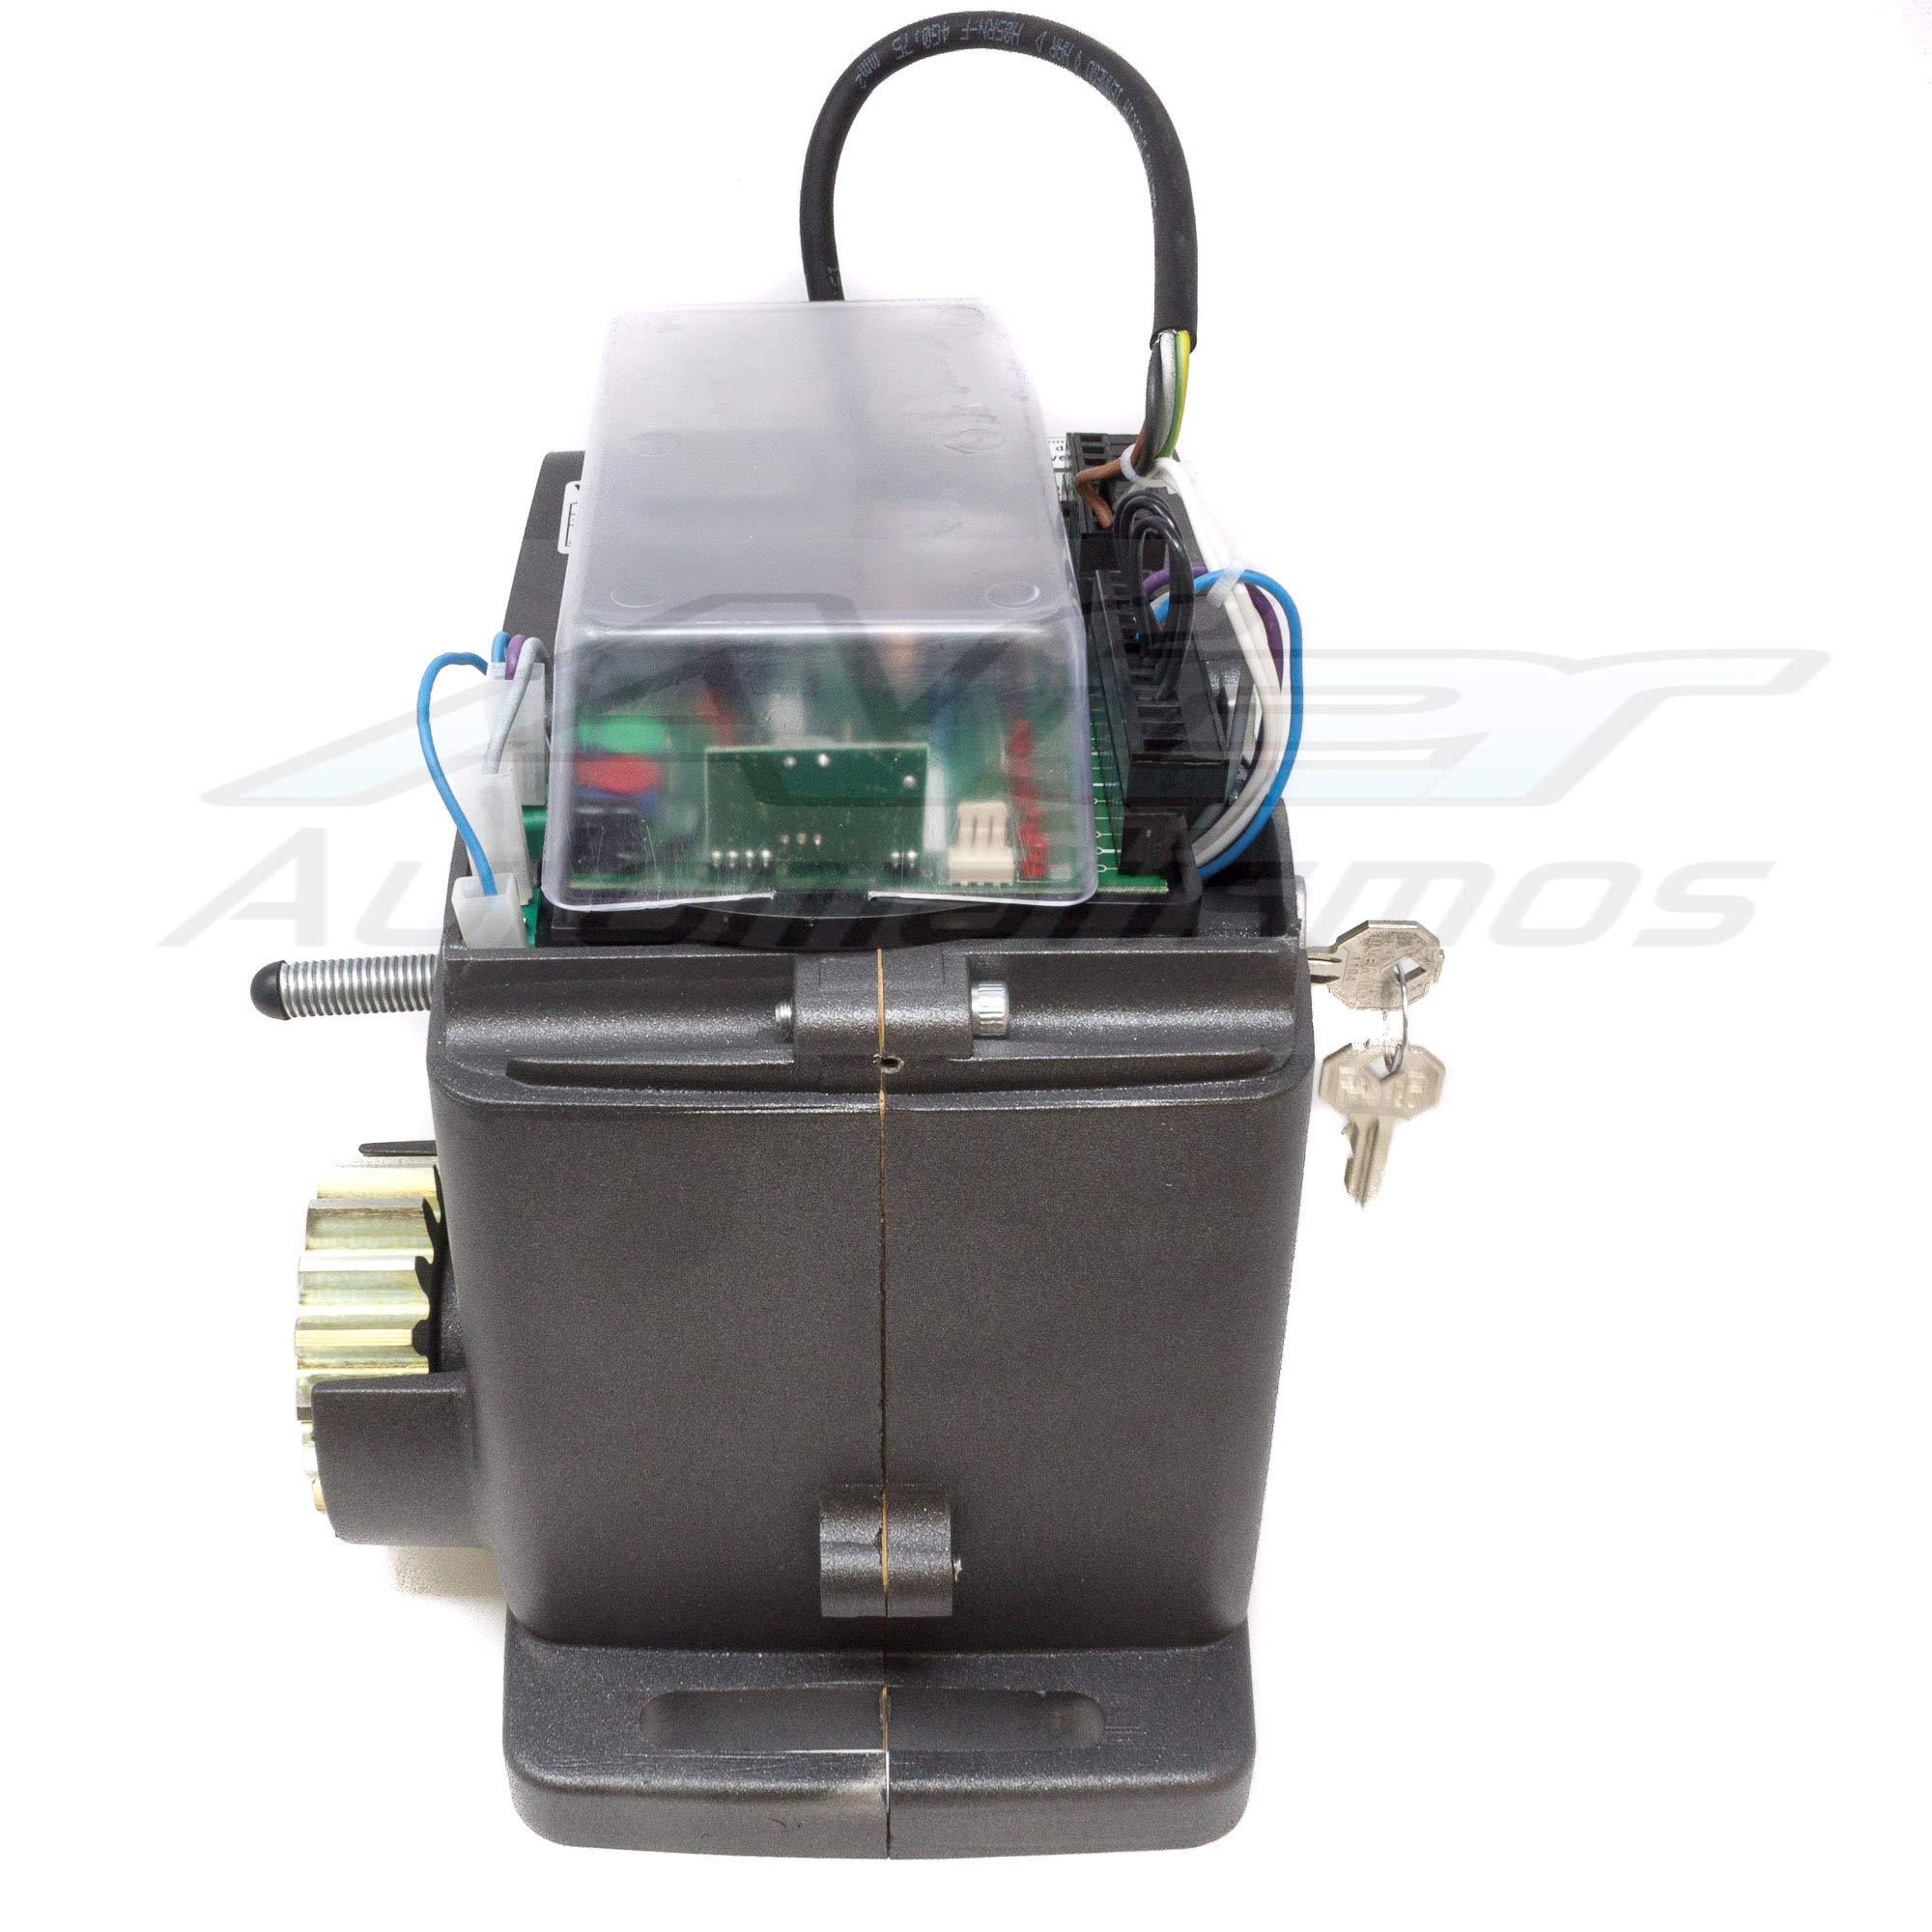 Kit motor para automatizar tu puerta de garaje o cancela corredera ...